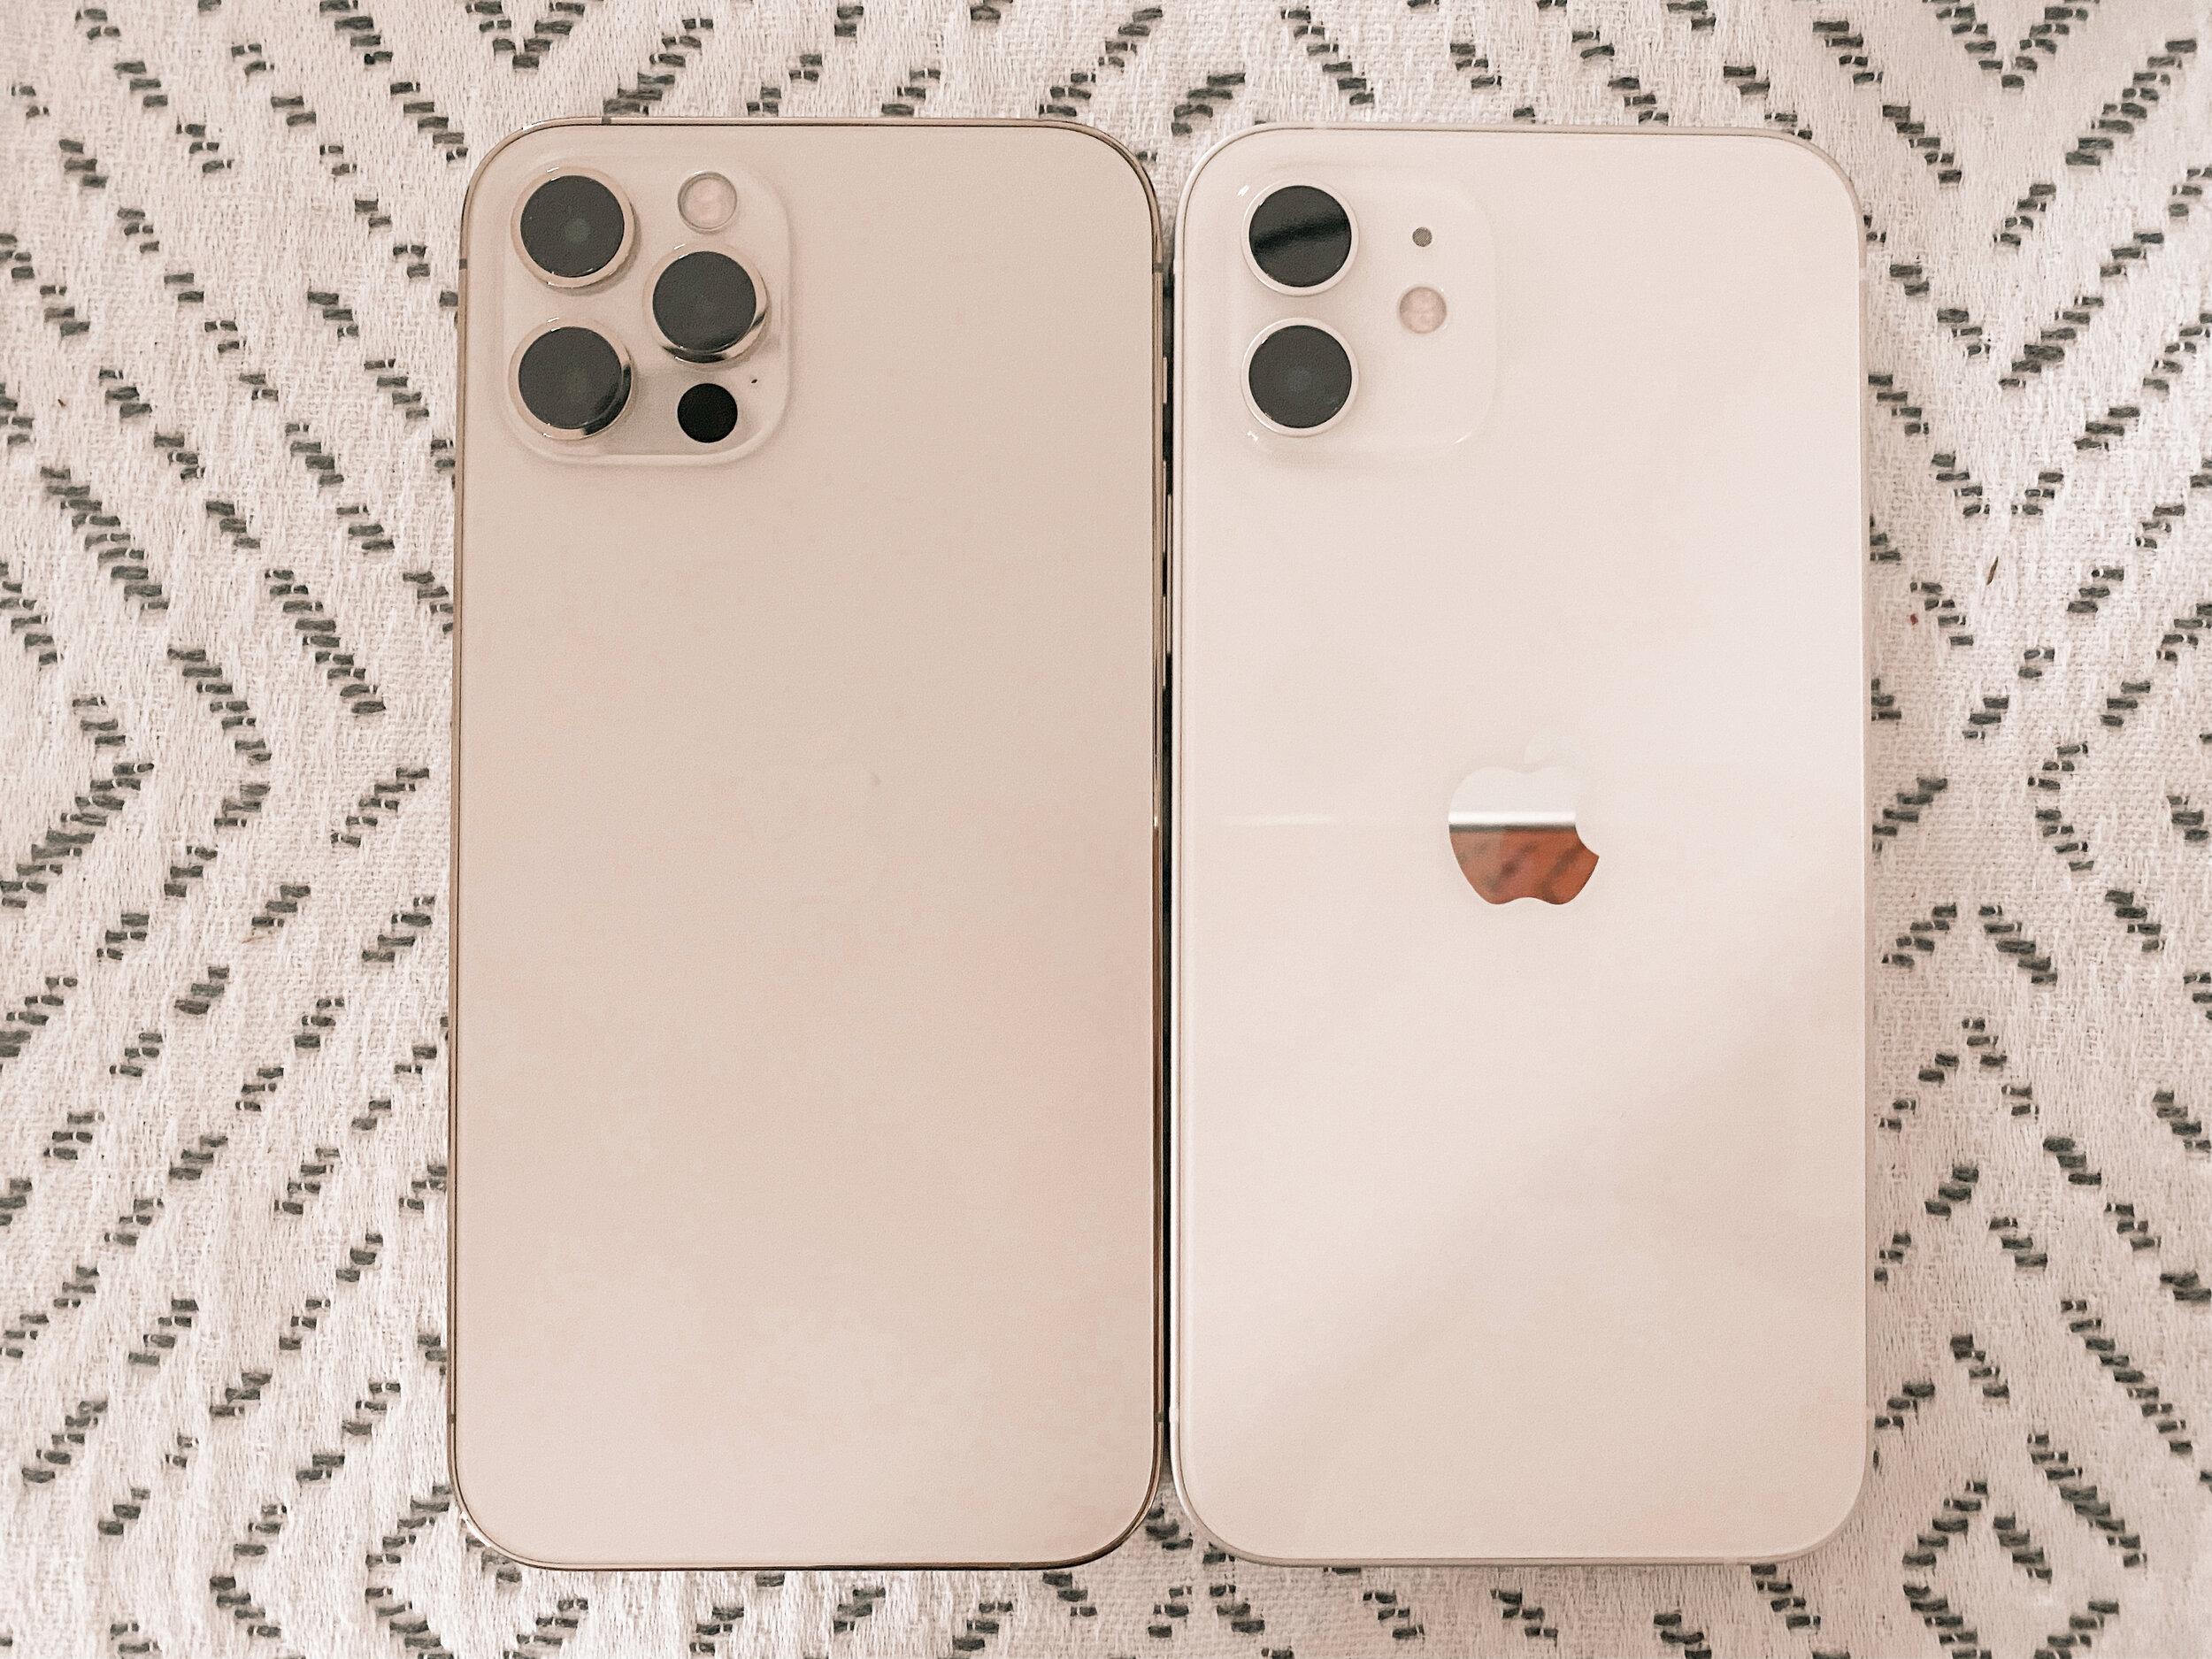 Left, iphone 12 PRO. Right, iPhone 12.